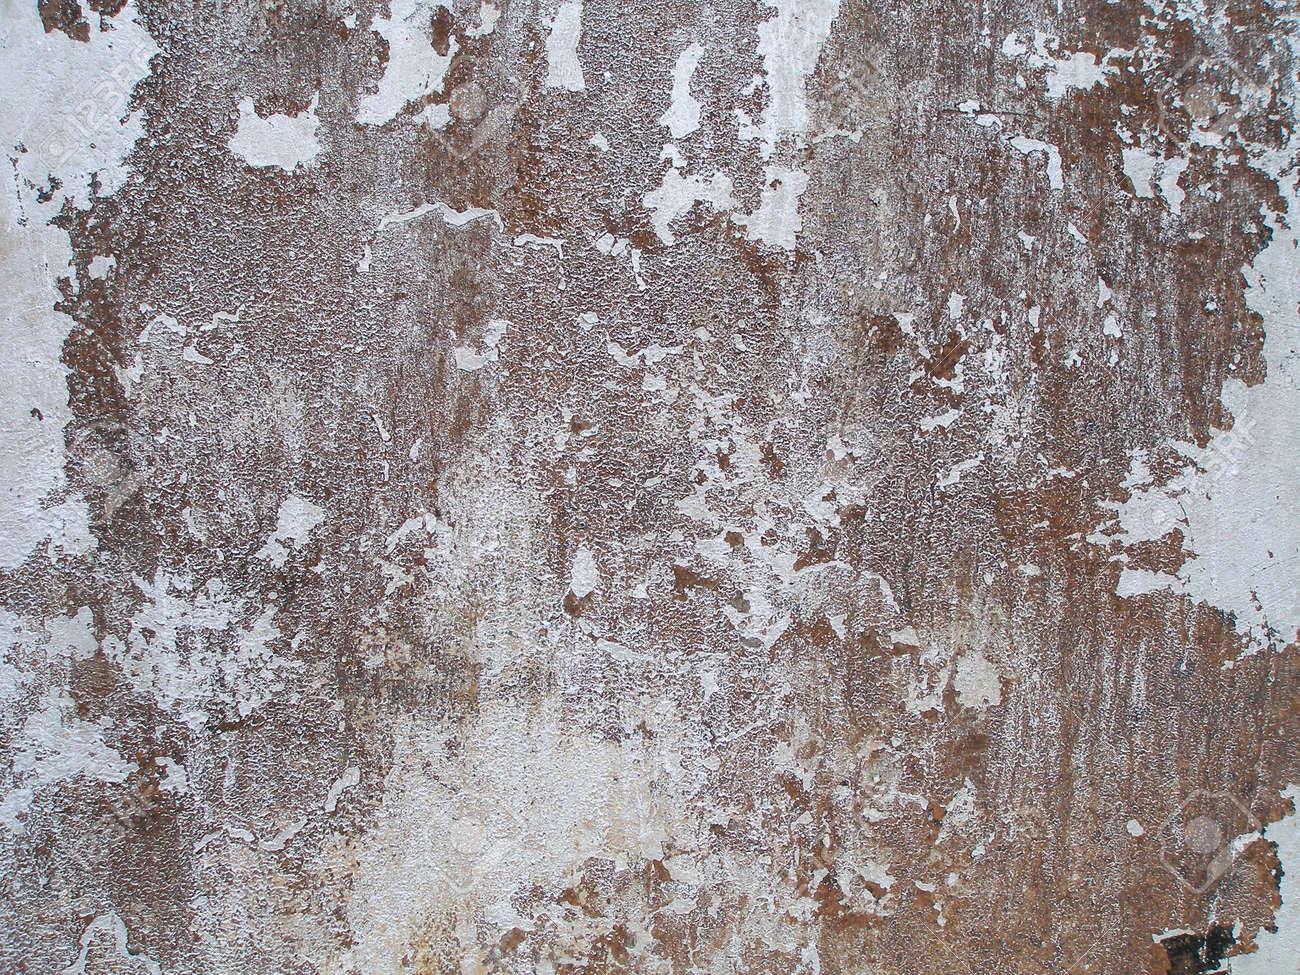 Peeling Farbe Und Rost Textur Wheathered Metall Abstrakte Textur